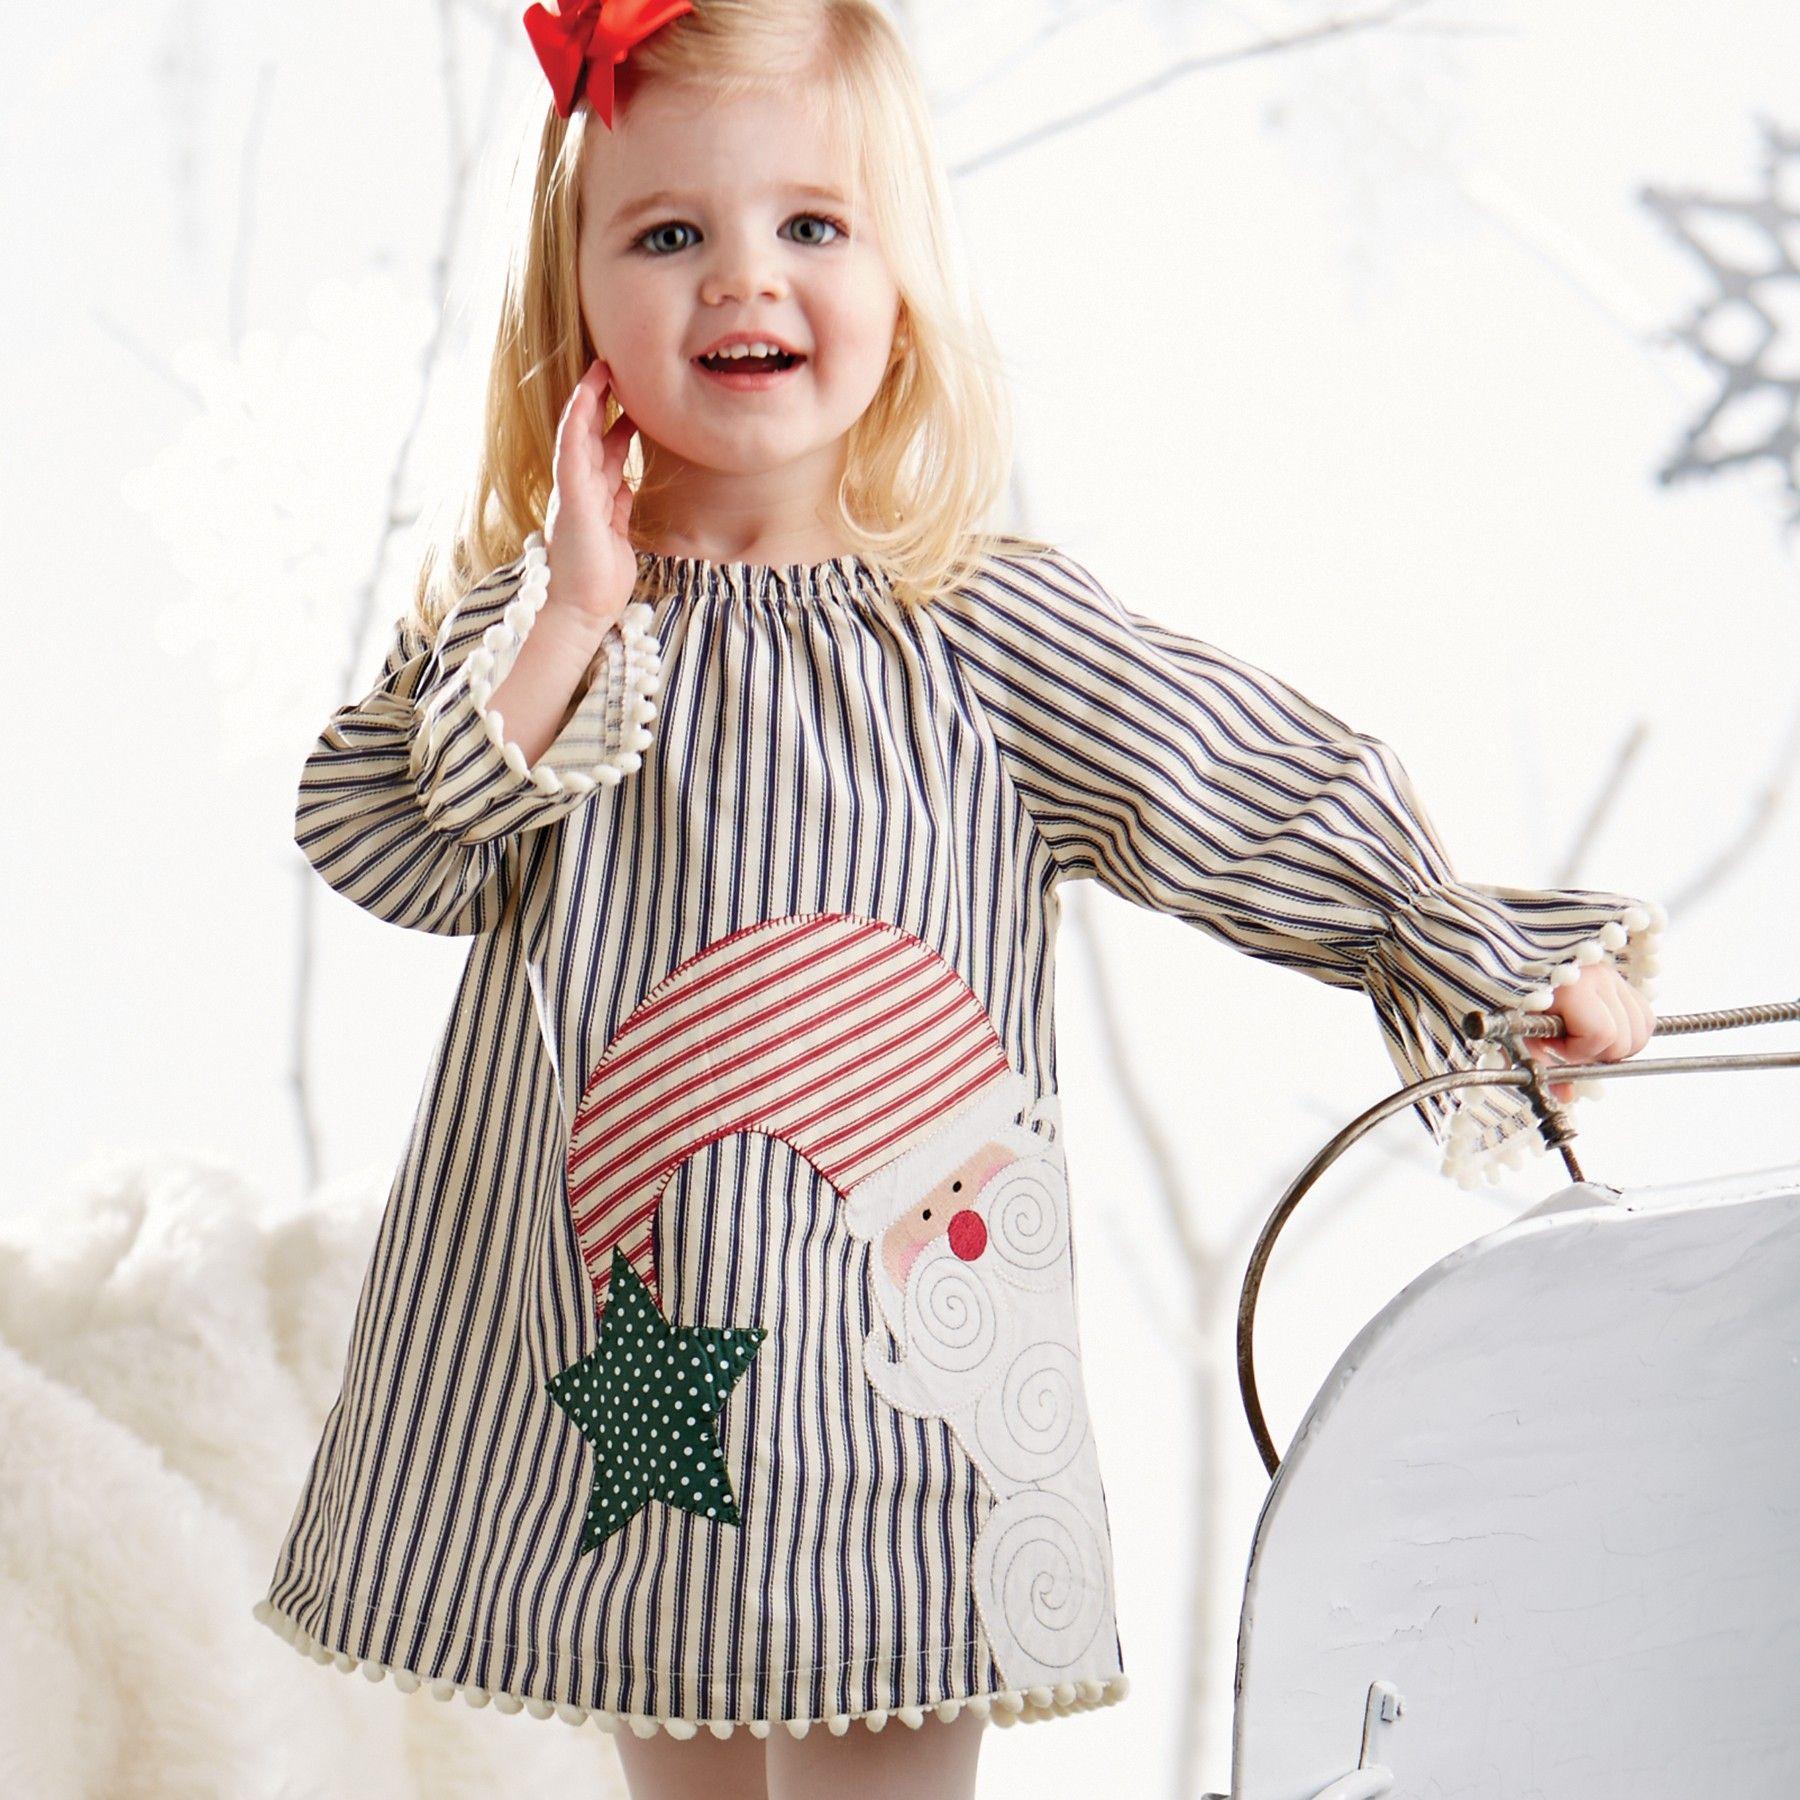 Santa Dress by Mud Pie I think I can make something similar Super